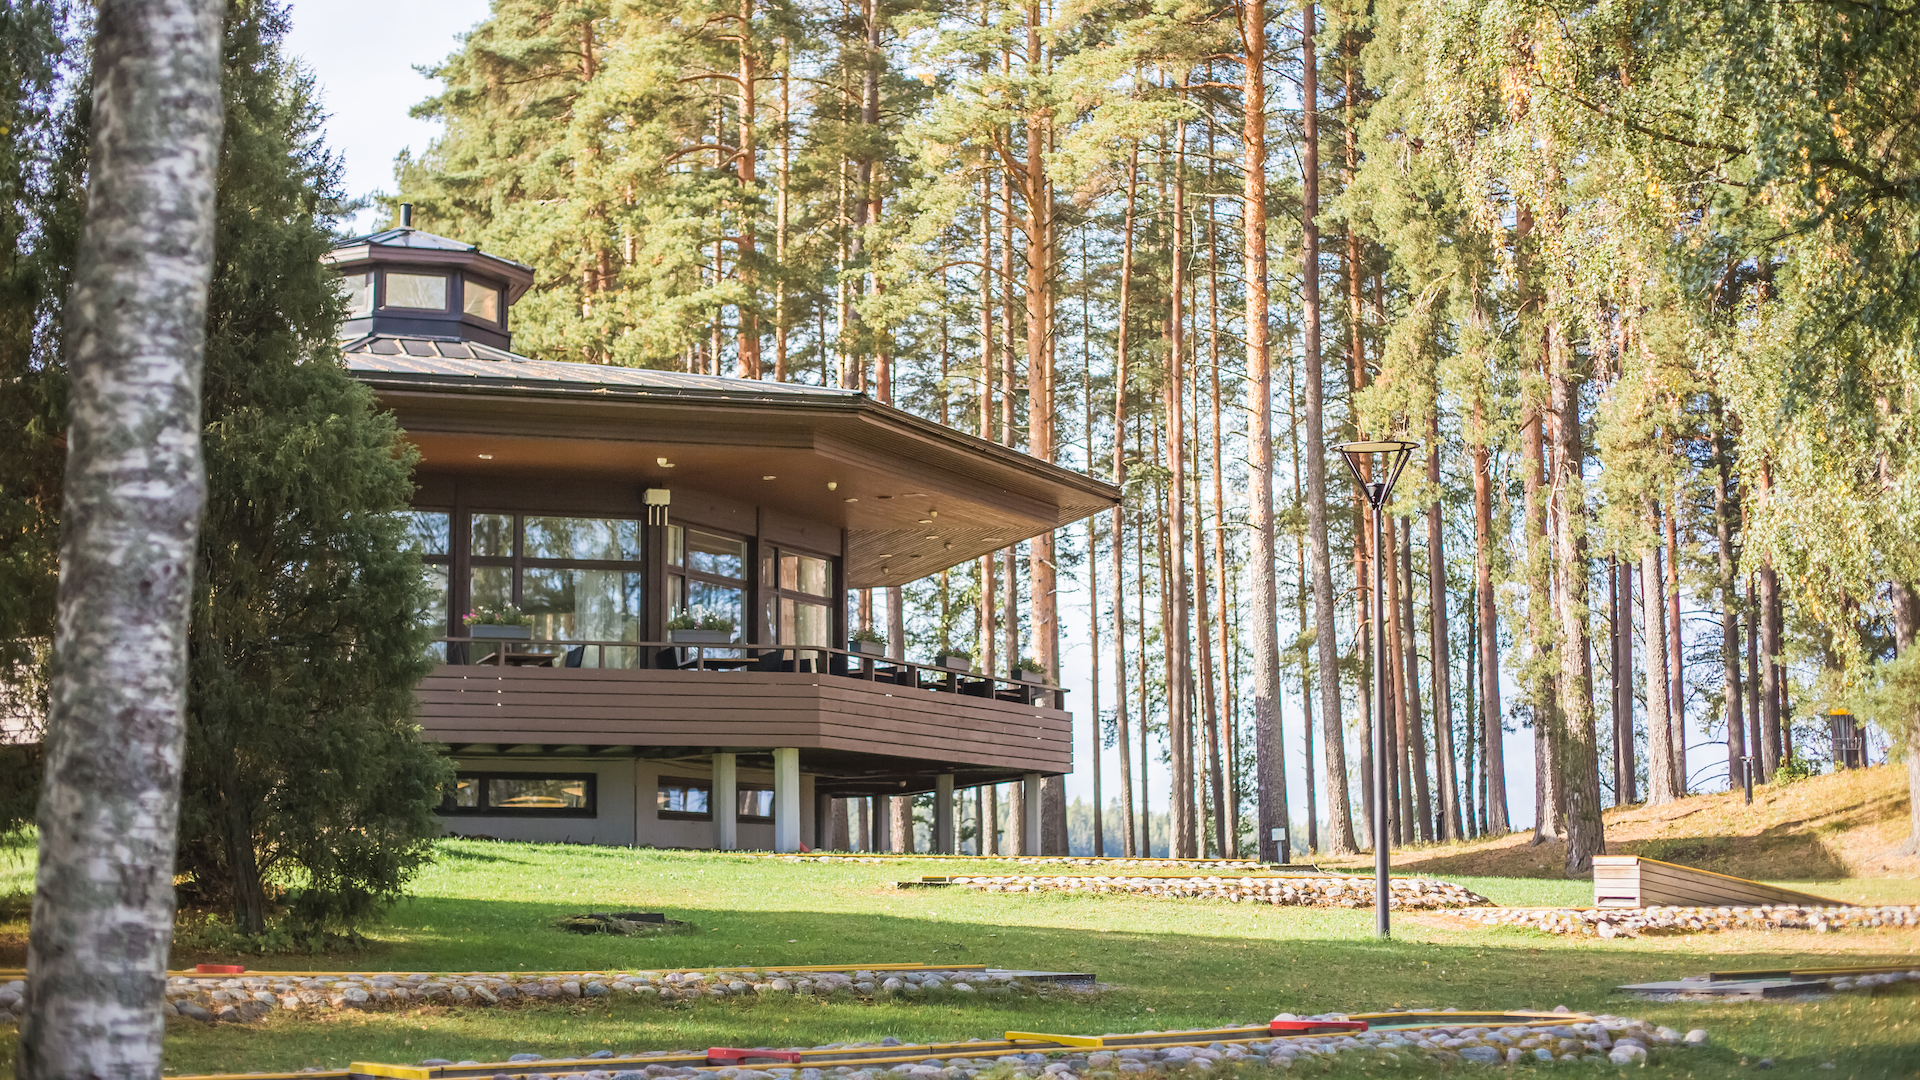 Petäys Lakeland Resort